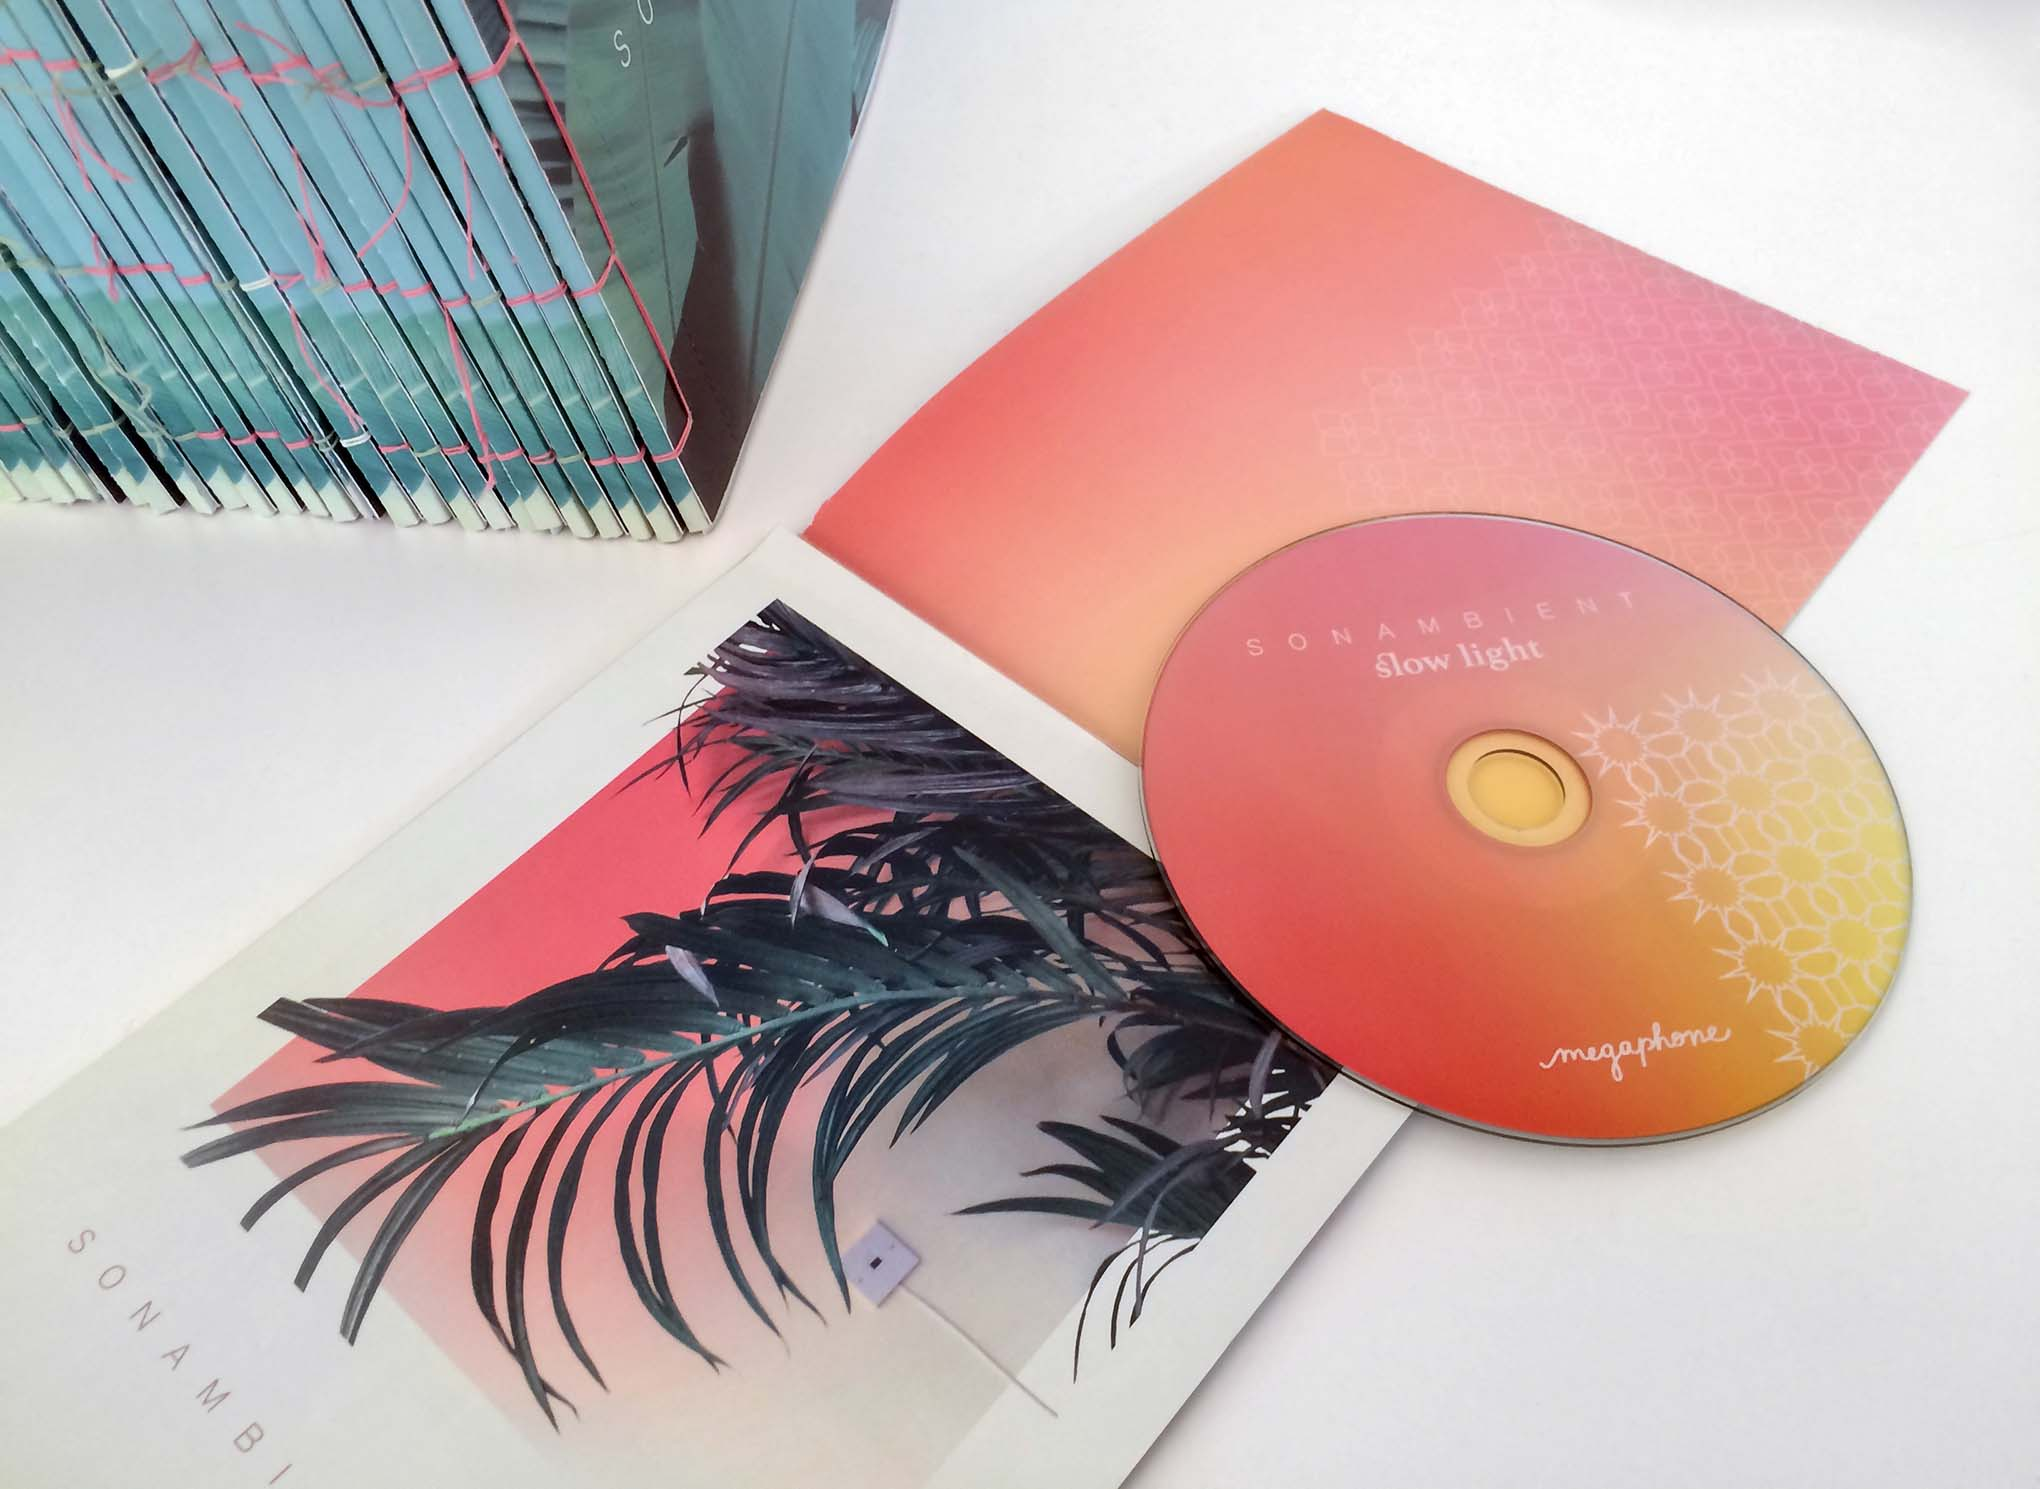 SONAMBIENT SLOW LIGHT ALBUM ARTWORK 06